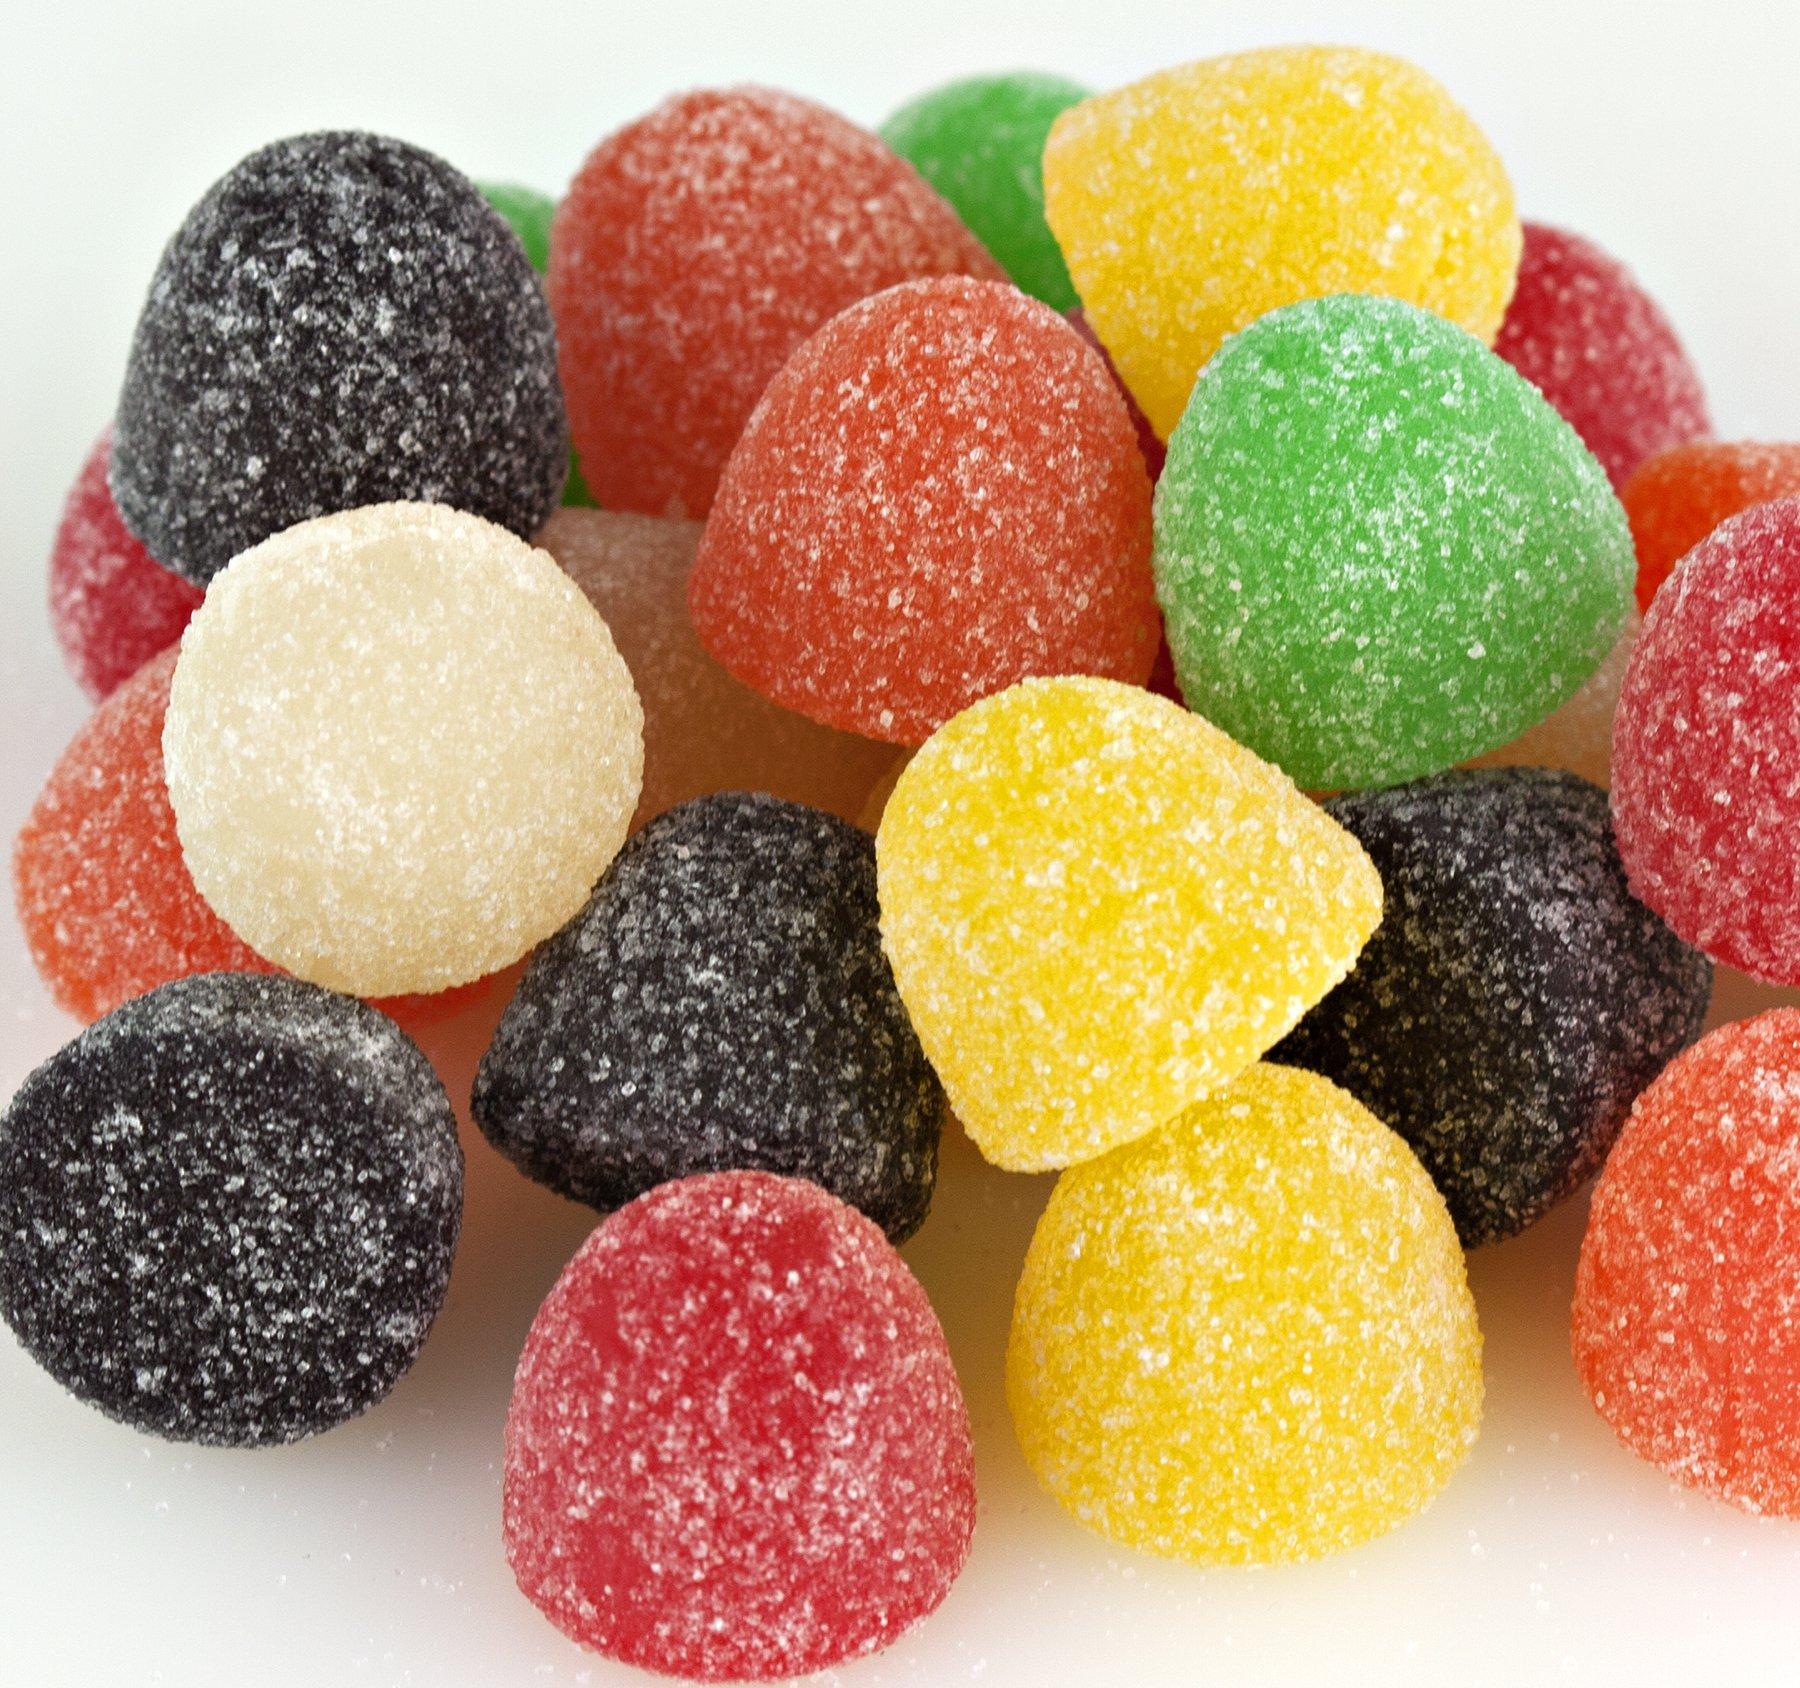 Assorted Large Gumdrops Candy, 1.2 Lb. Bag